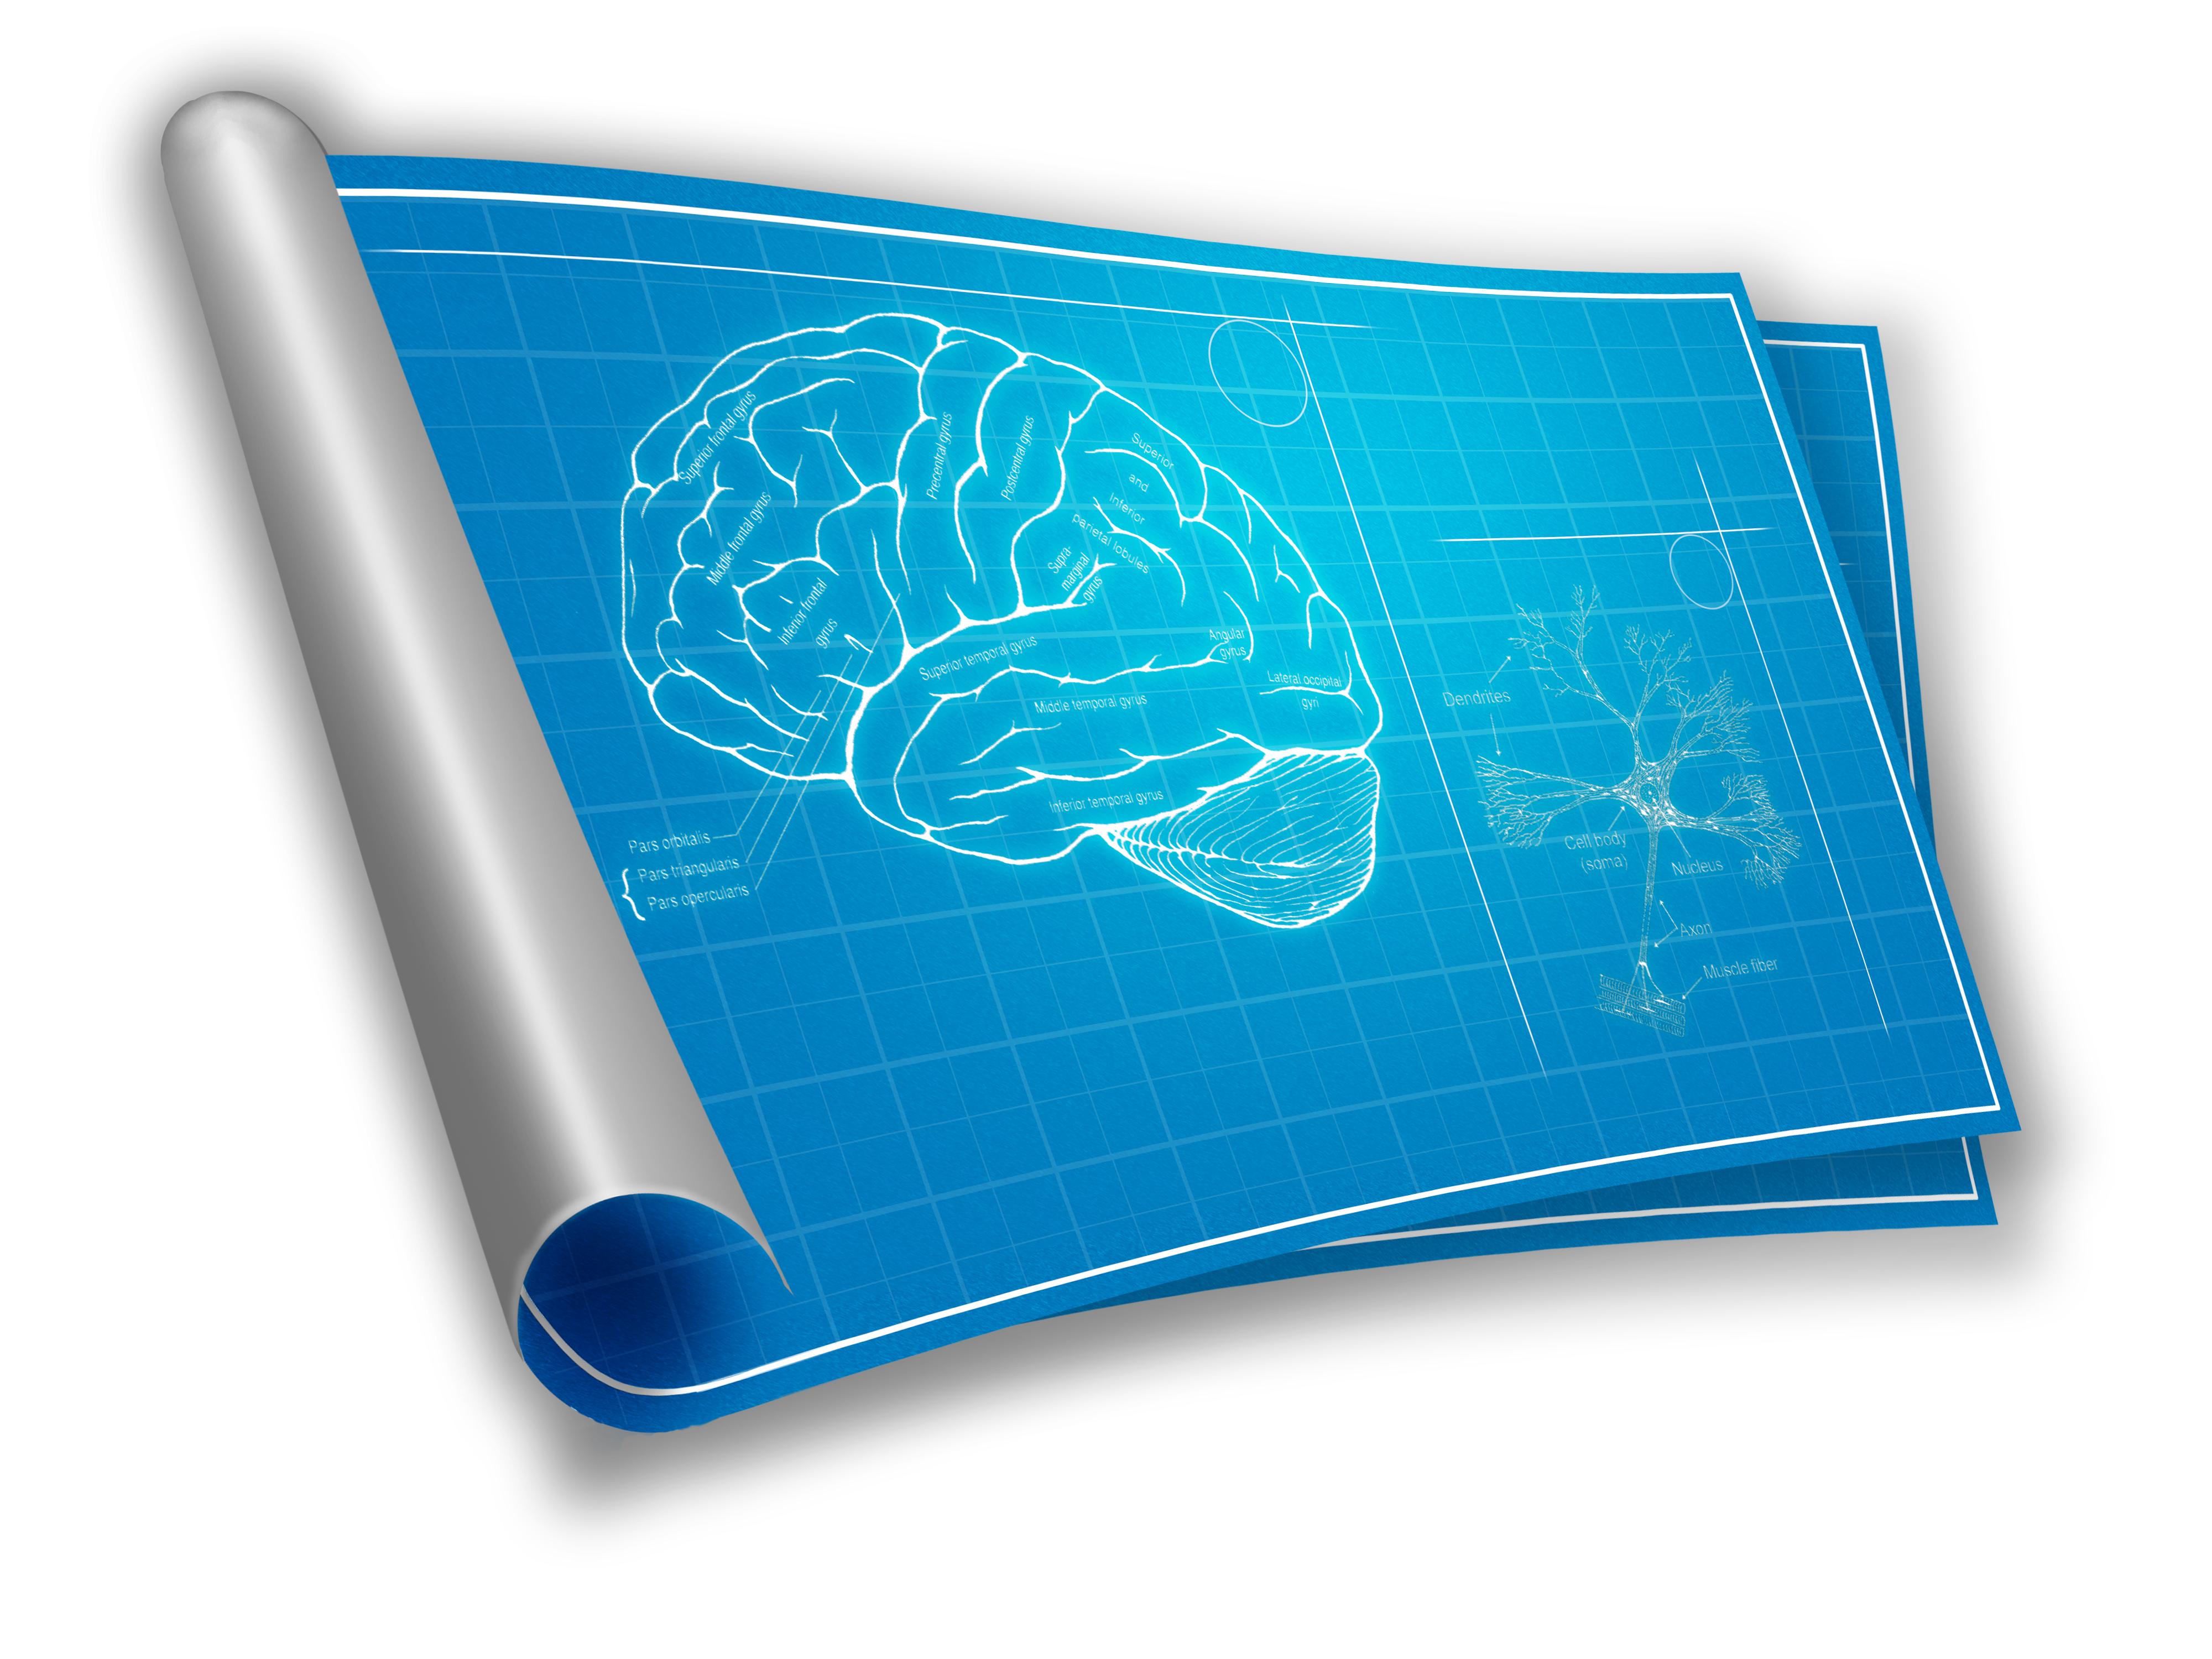 Seven levels human development program online series beabove shutterstock62918872 malvernweather Images